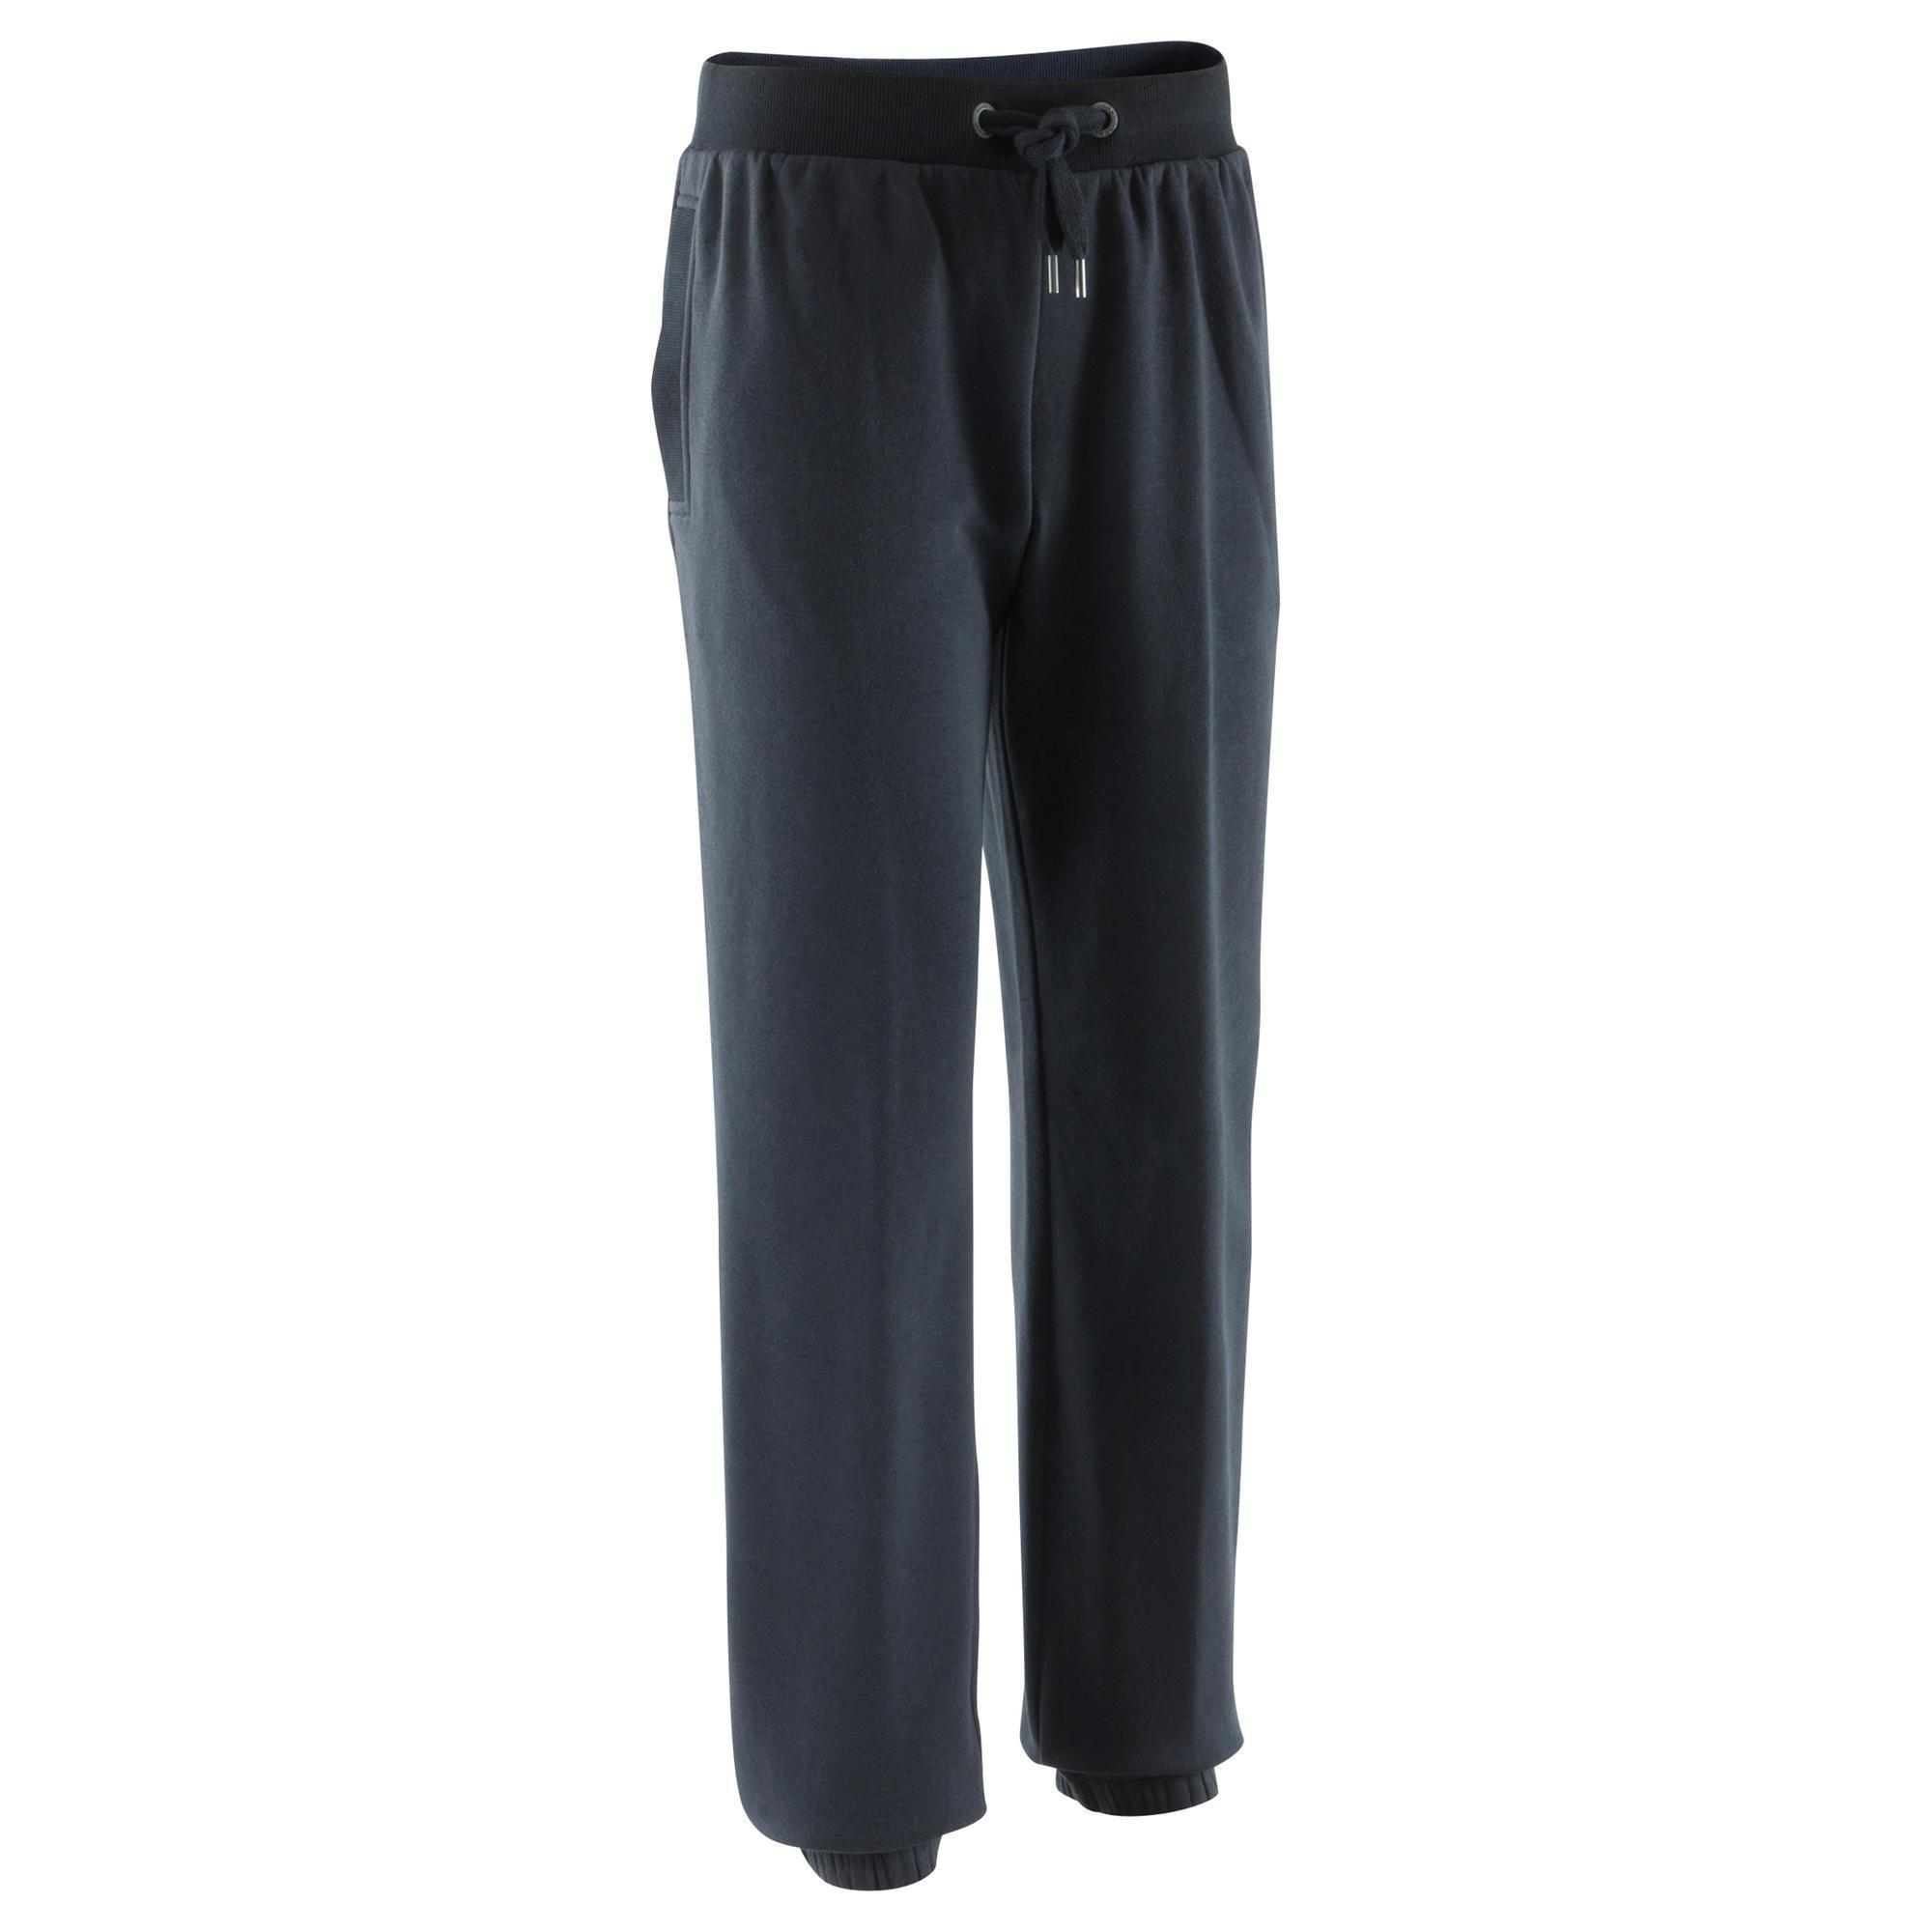 pantalon 920 regular gym pilates homme noir domyos by. Black Bedroom Furniture Sets. Home Design Ideas